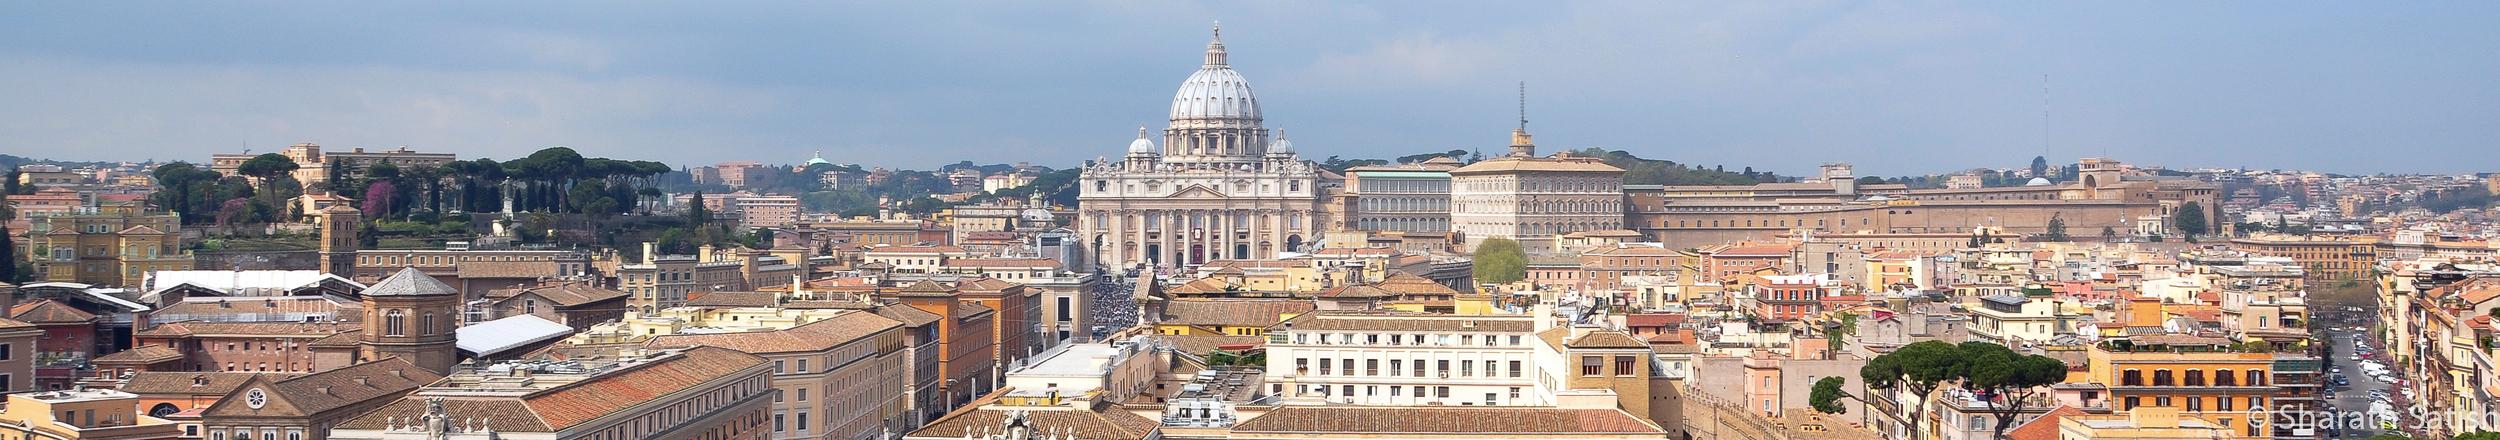 Vatican City seen from Castel Sant'Angelo